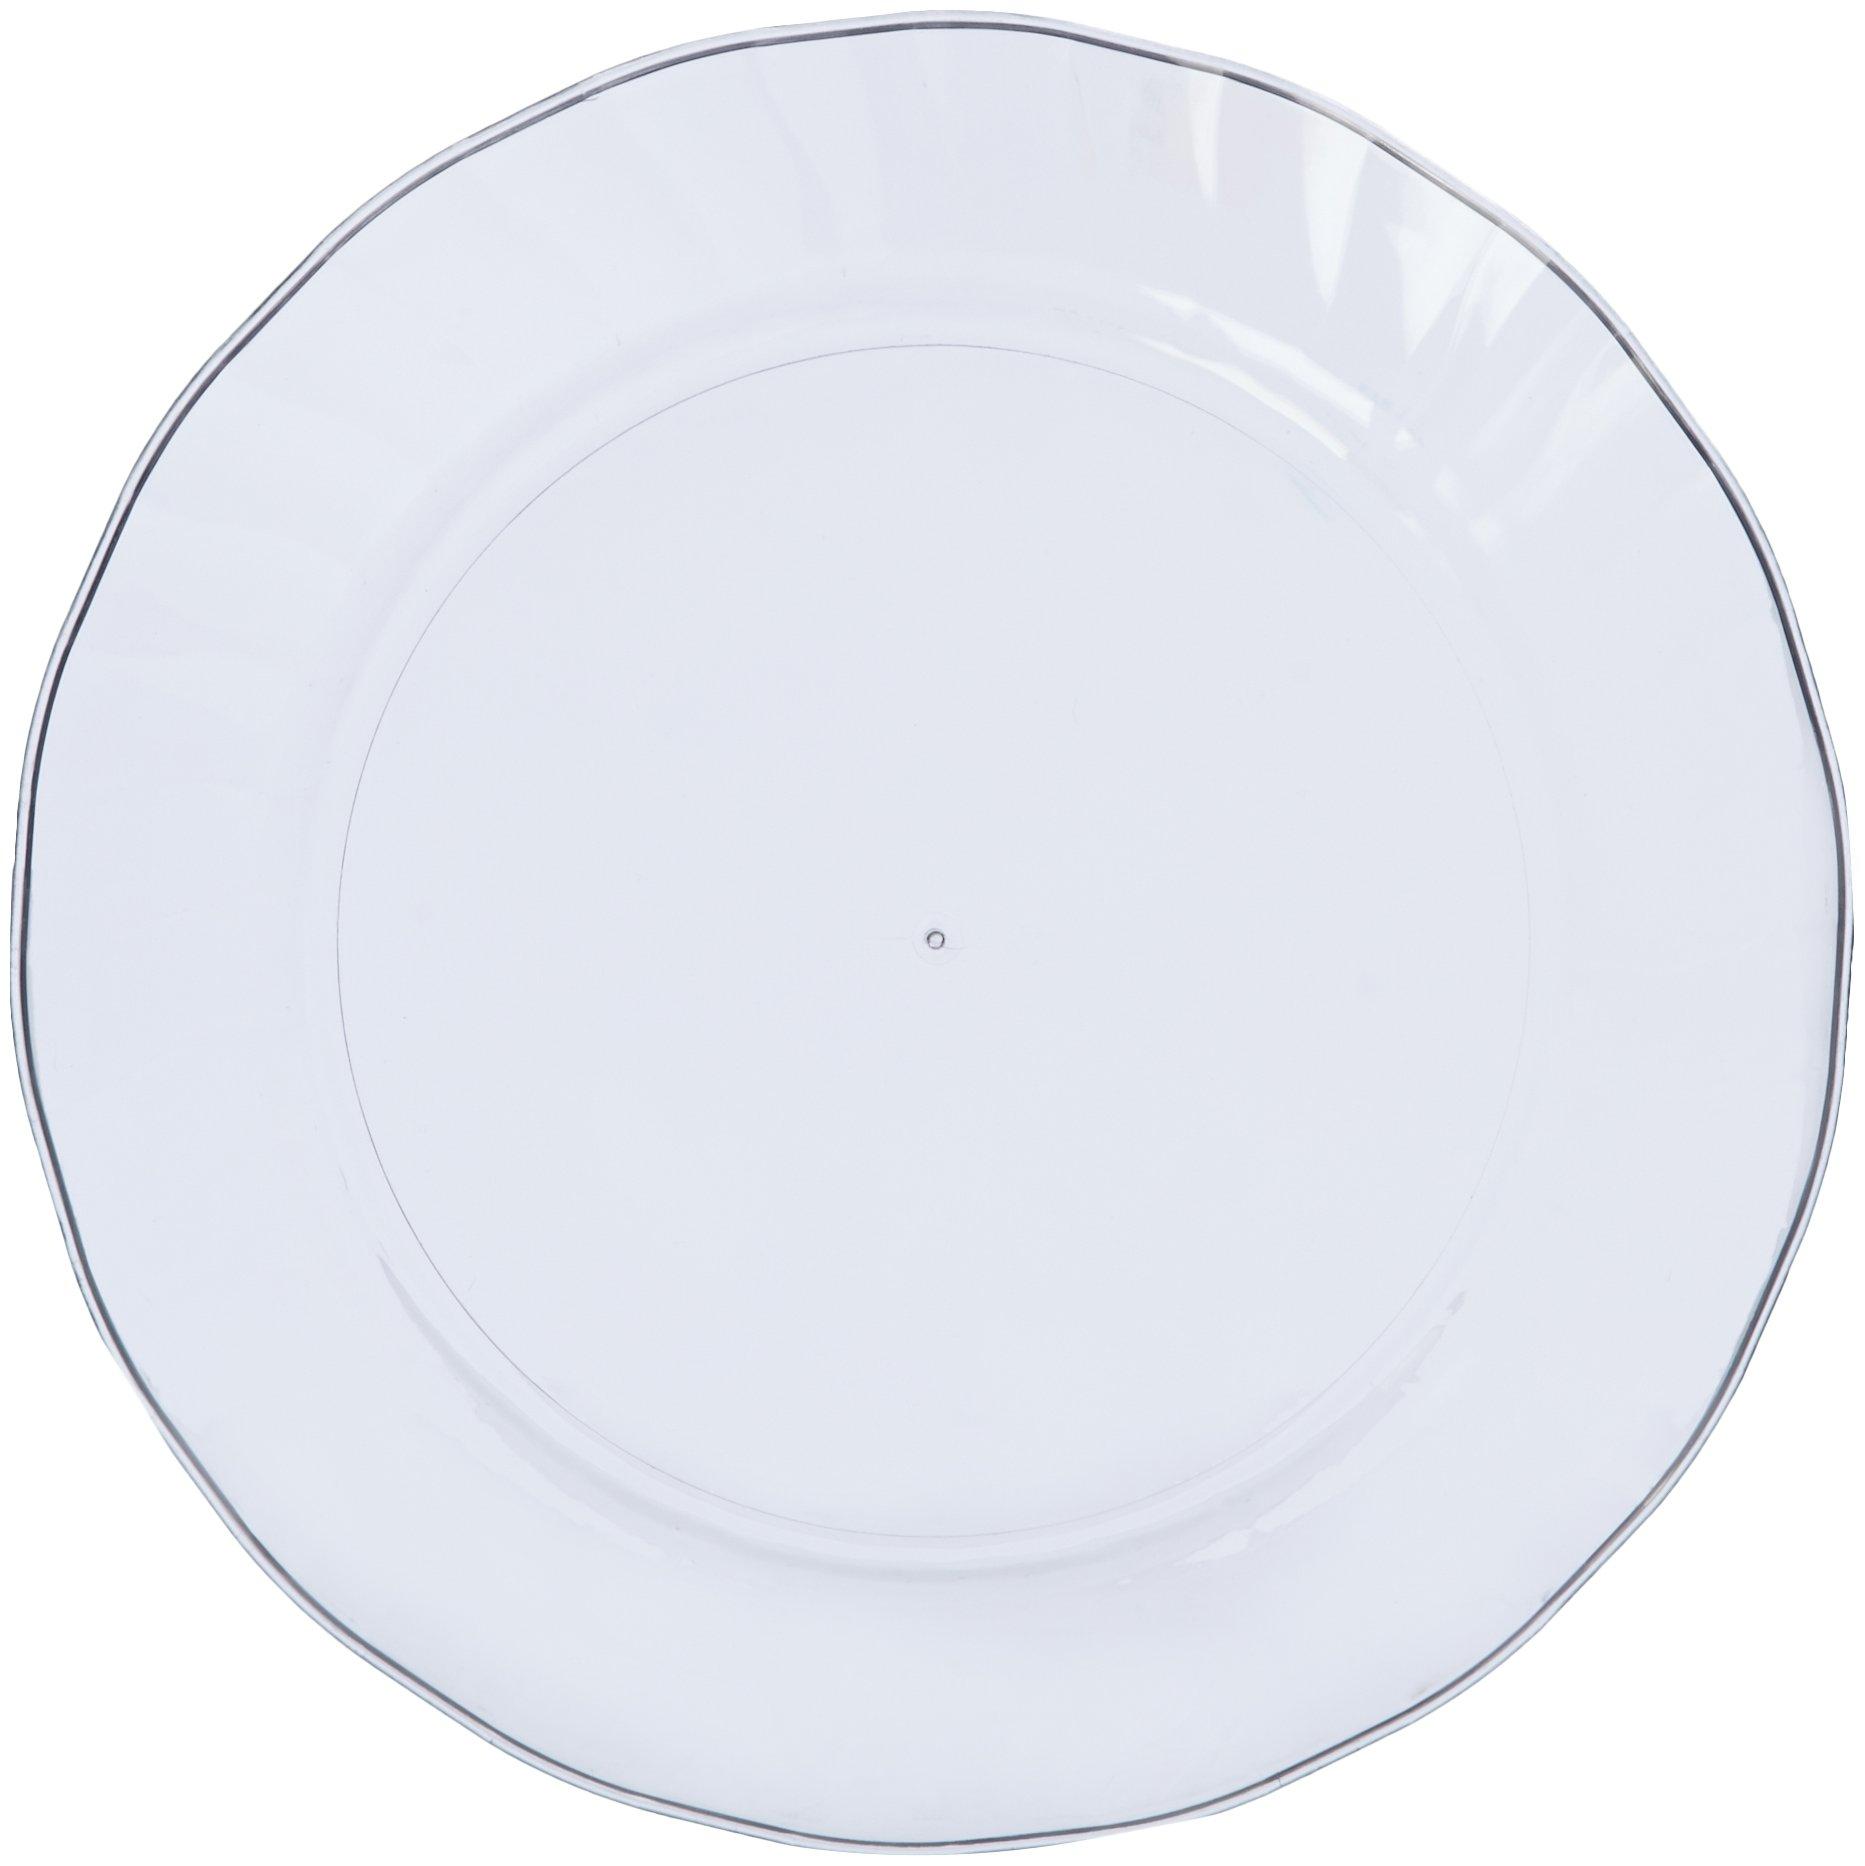 AmazonBasics Disposable Plastic Plates - 100-Pack, 7.5-inch by AmazonBasics (Image #3)